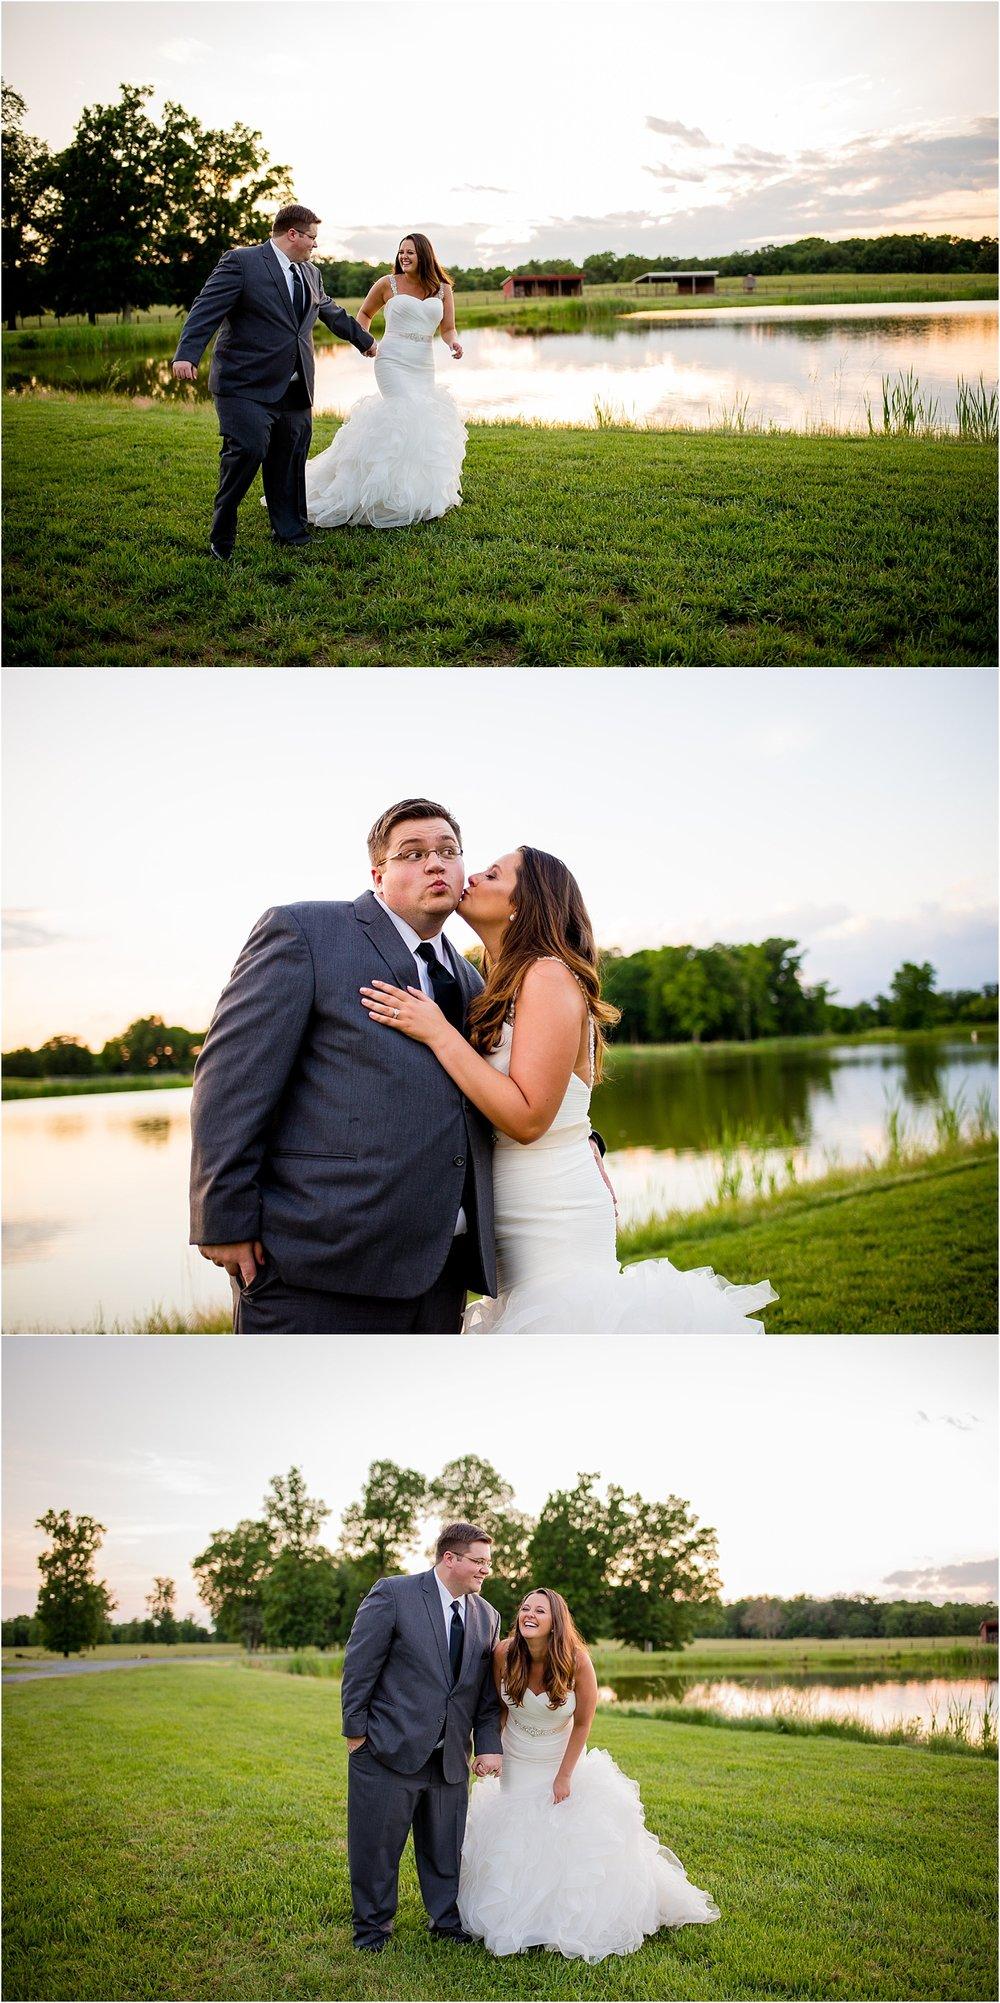 Fun-Outdoor-Golden-Hour-Bride-Groom-Portraits-Brittany-Josh-Farm-At-Busharbor-Spring-Wedding